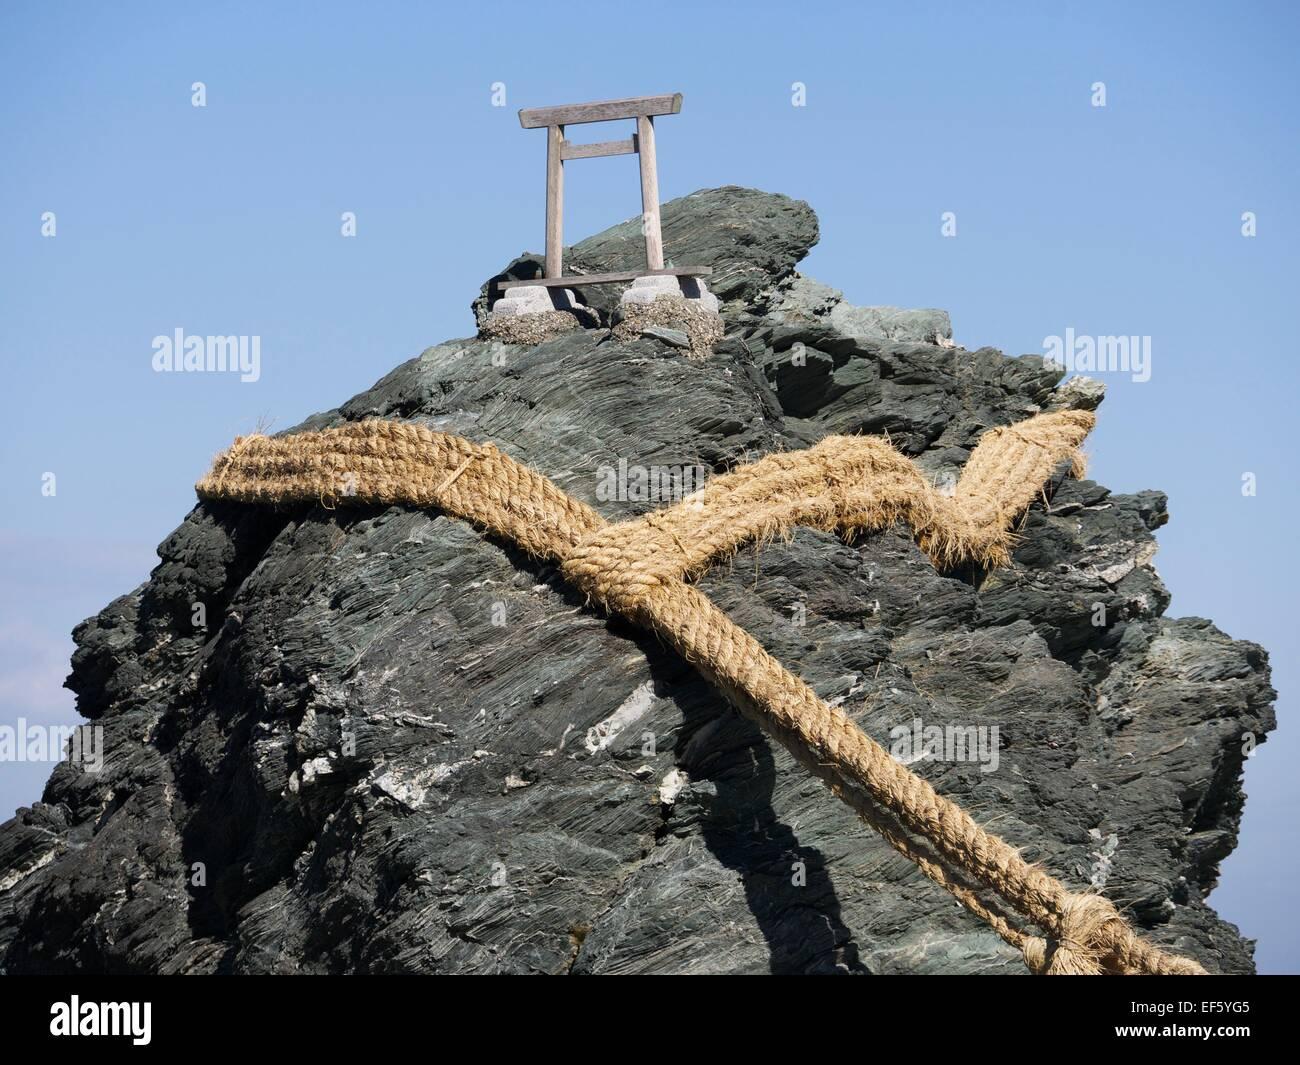 Miniature Torii Gate at Meoto Iwa in Japan - Stock Image